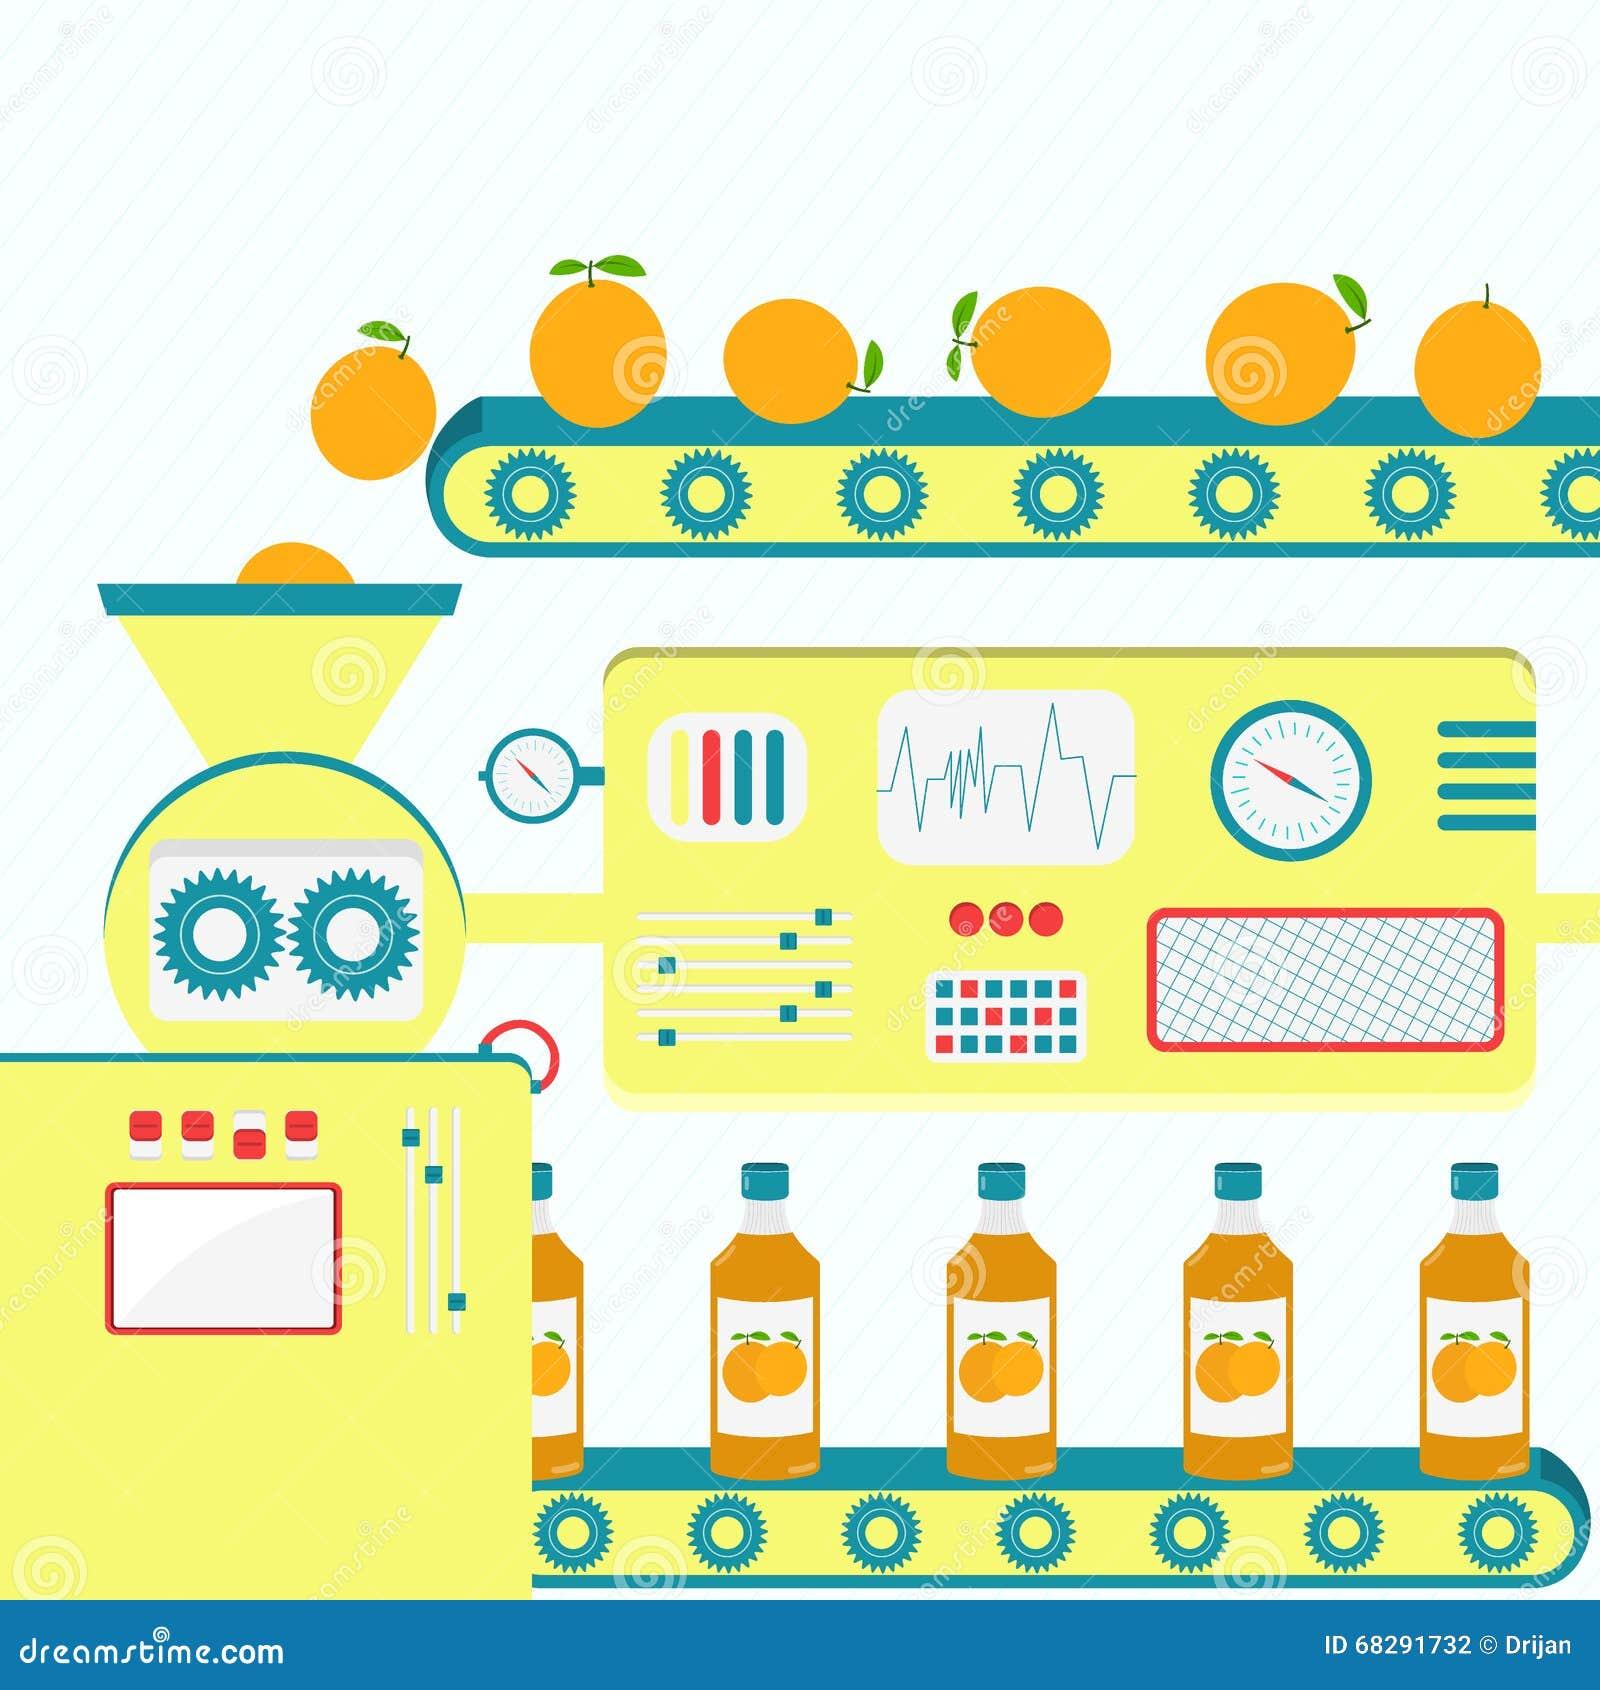 Industrial production of orange juice